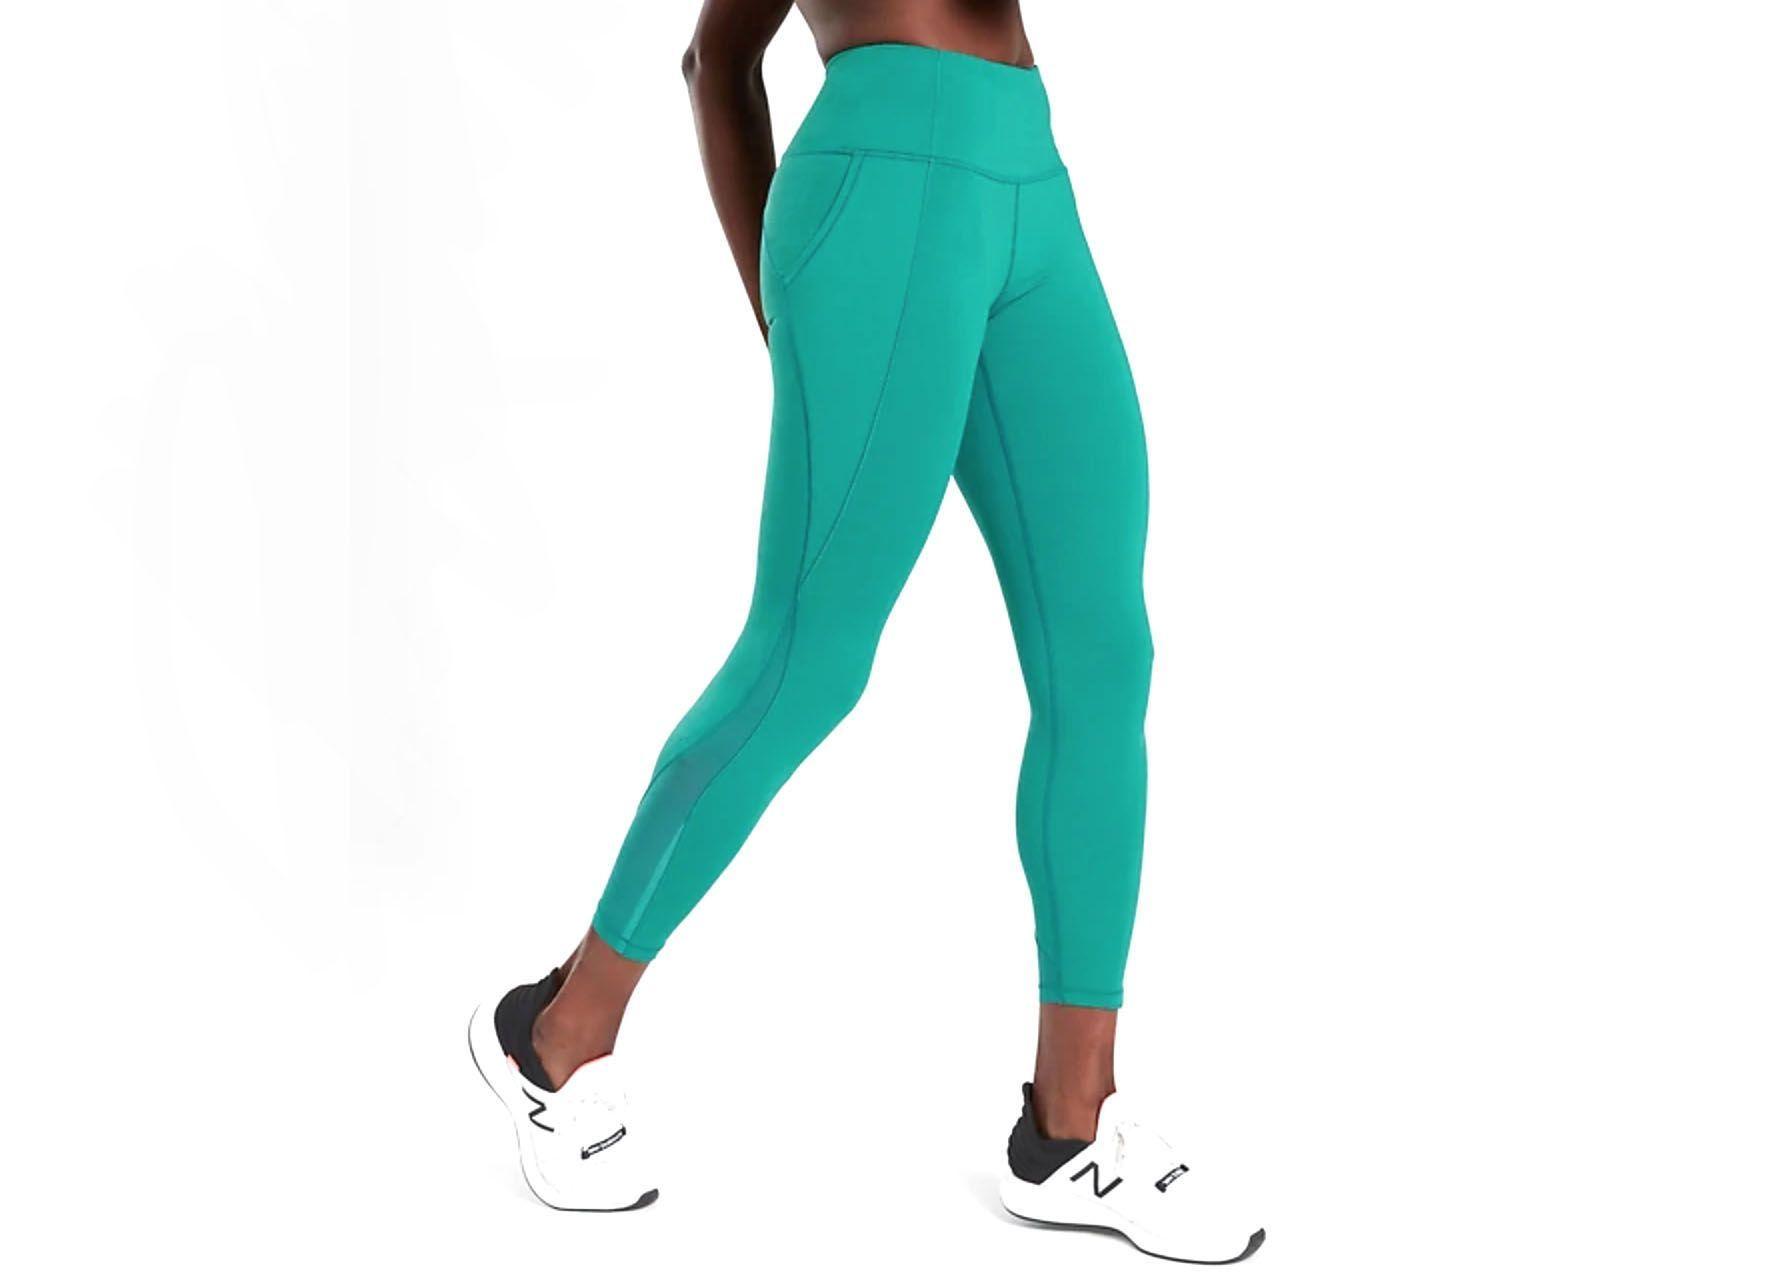 60c78f5eb7a Best Running Leggings - Workout Pants 2019